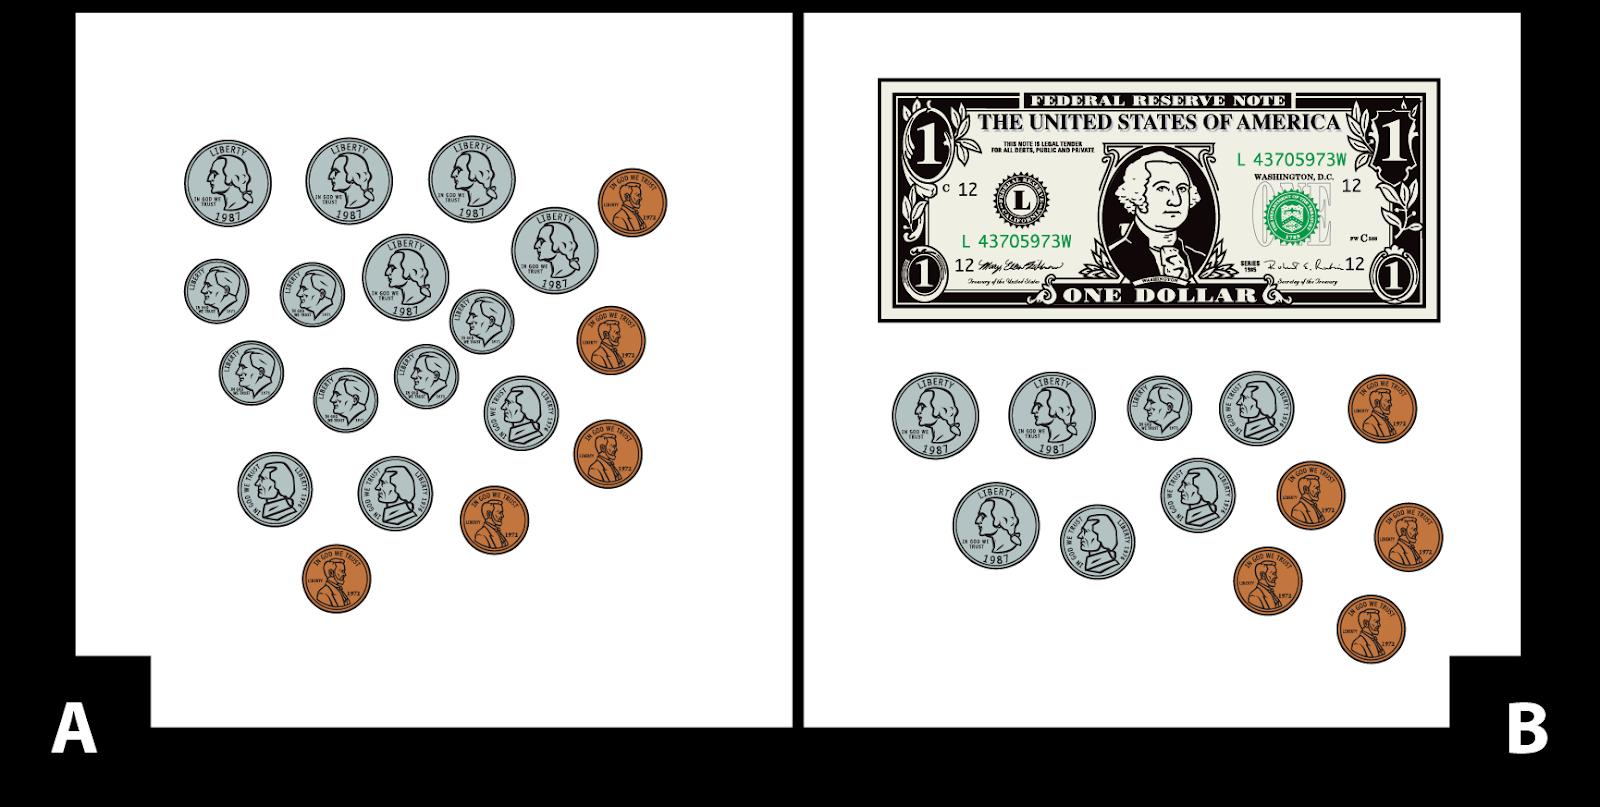 A: 5 monedas de 25 centavos, 6 monedas de 10 centavos, 3 monedas de 5 centavos y 5 monedas de 1 centavo. B: Un billete de un dólar, 3 monedas de 25 centavos, 1 moneda de 10 centavos, 3 monedas de 5 centavos y 5 monedas de 1 centavo.